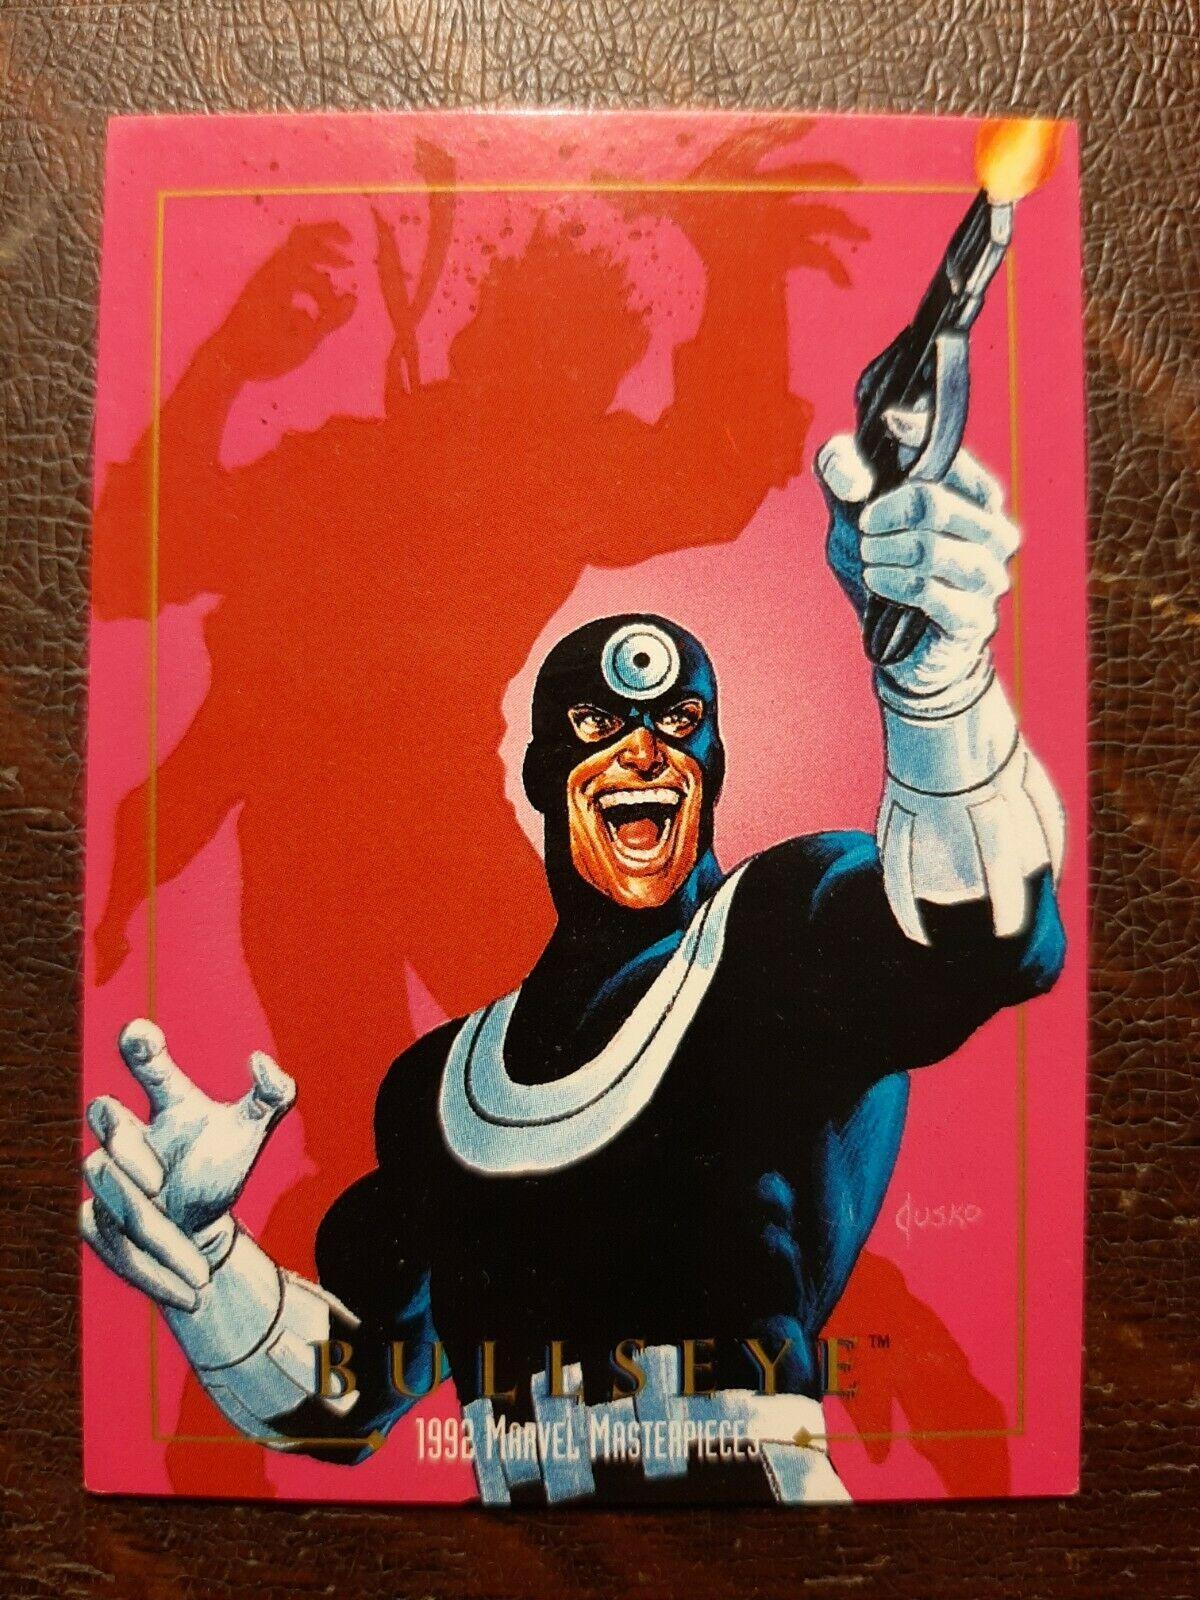 x1 1992 SkyBox Marvel Masterpieces Bullseye #19 Card  - $2.50